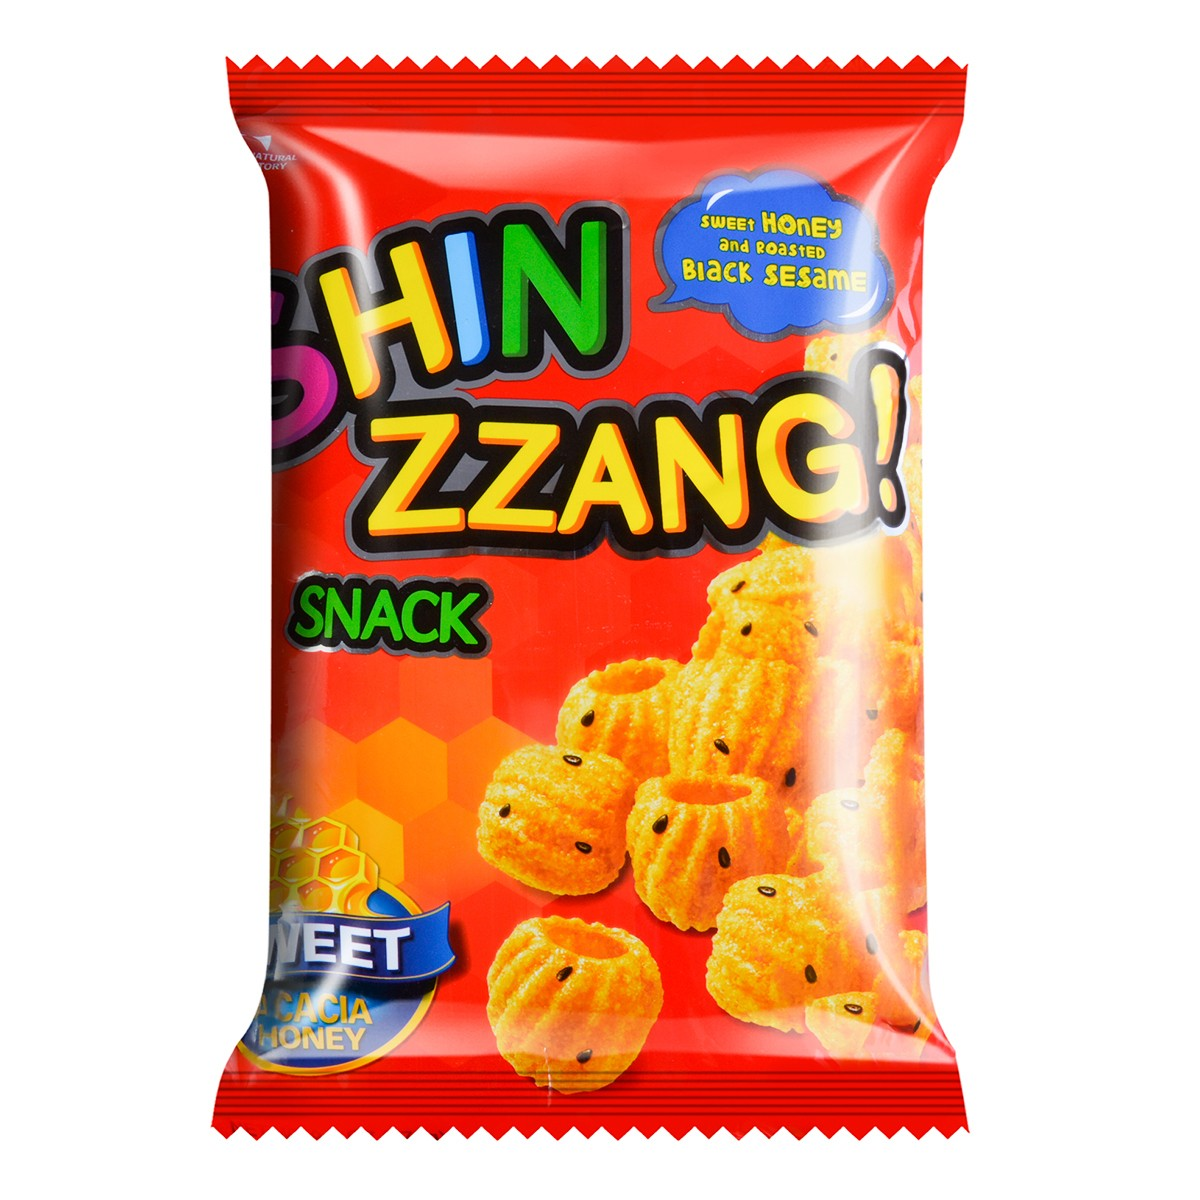 CROWN SHIN ZZANG Snack Sesame&Honey 275g